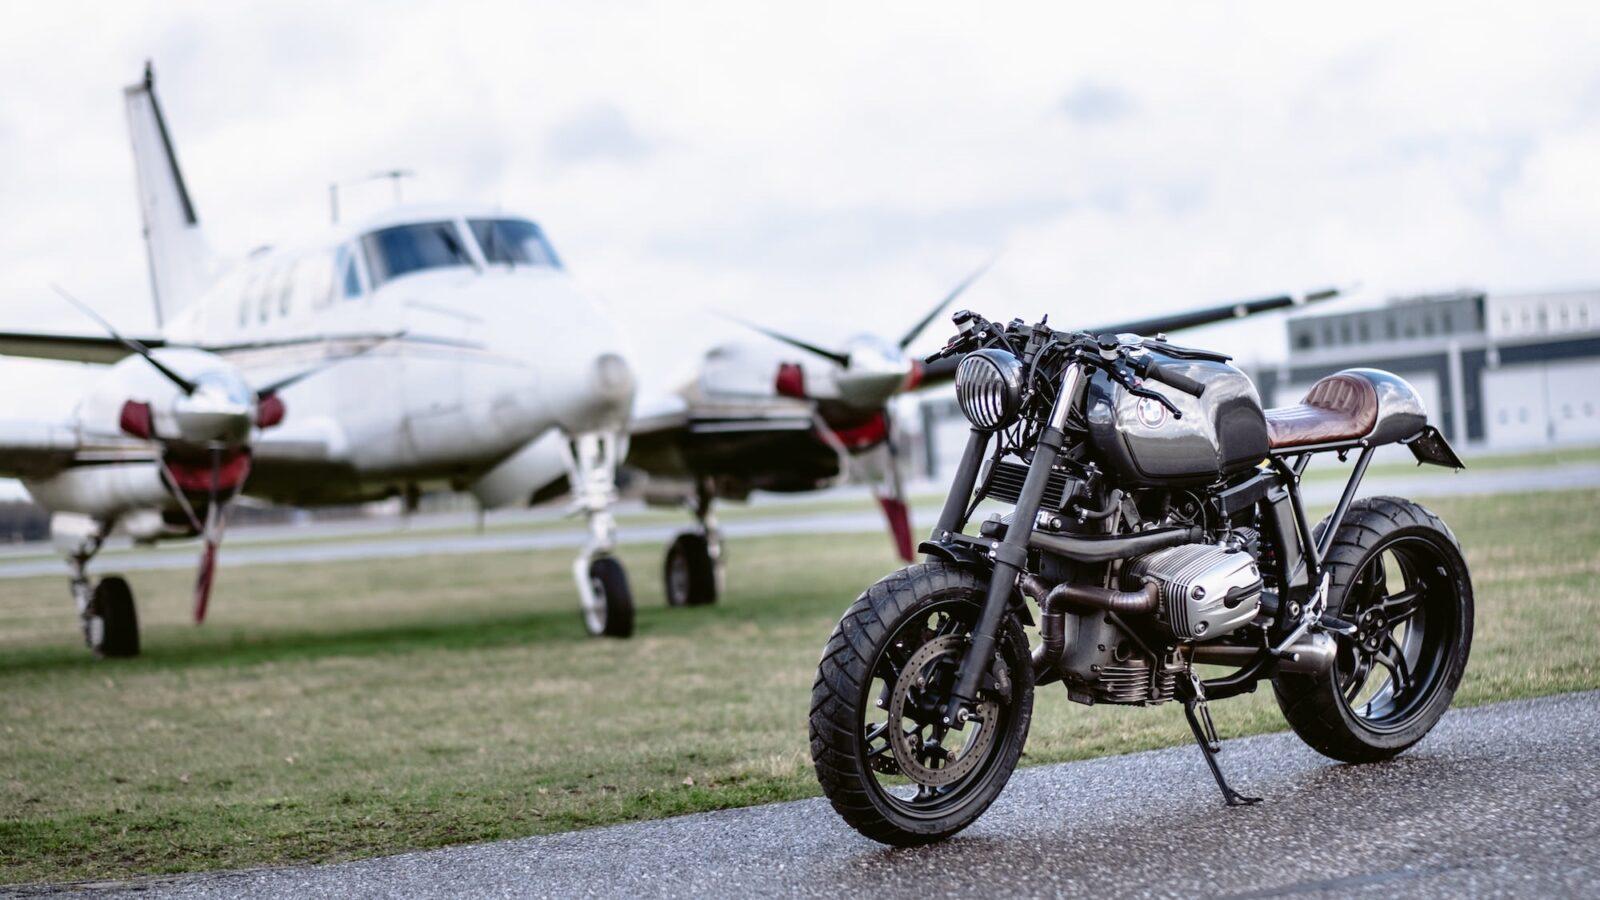 bmw r1100s custom motorcycle 14 1600x900 - Moto Adonis BMW R1100S